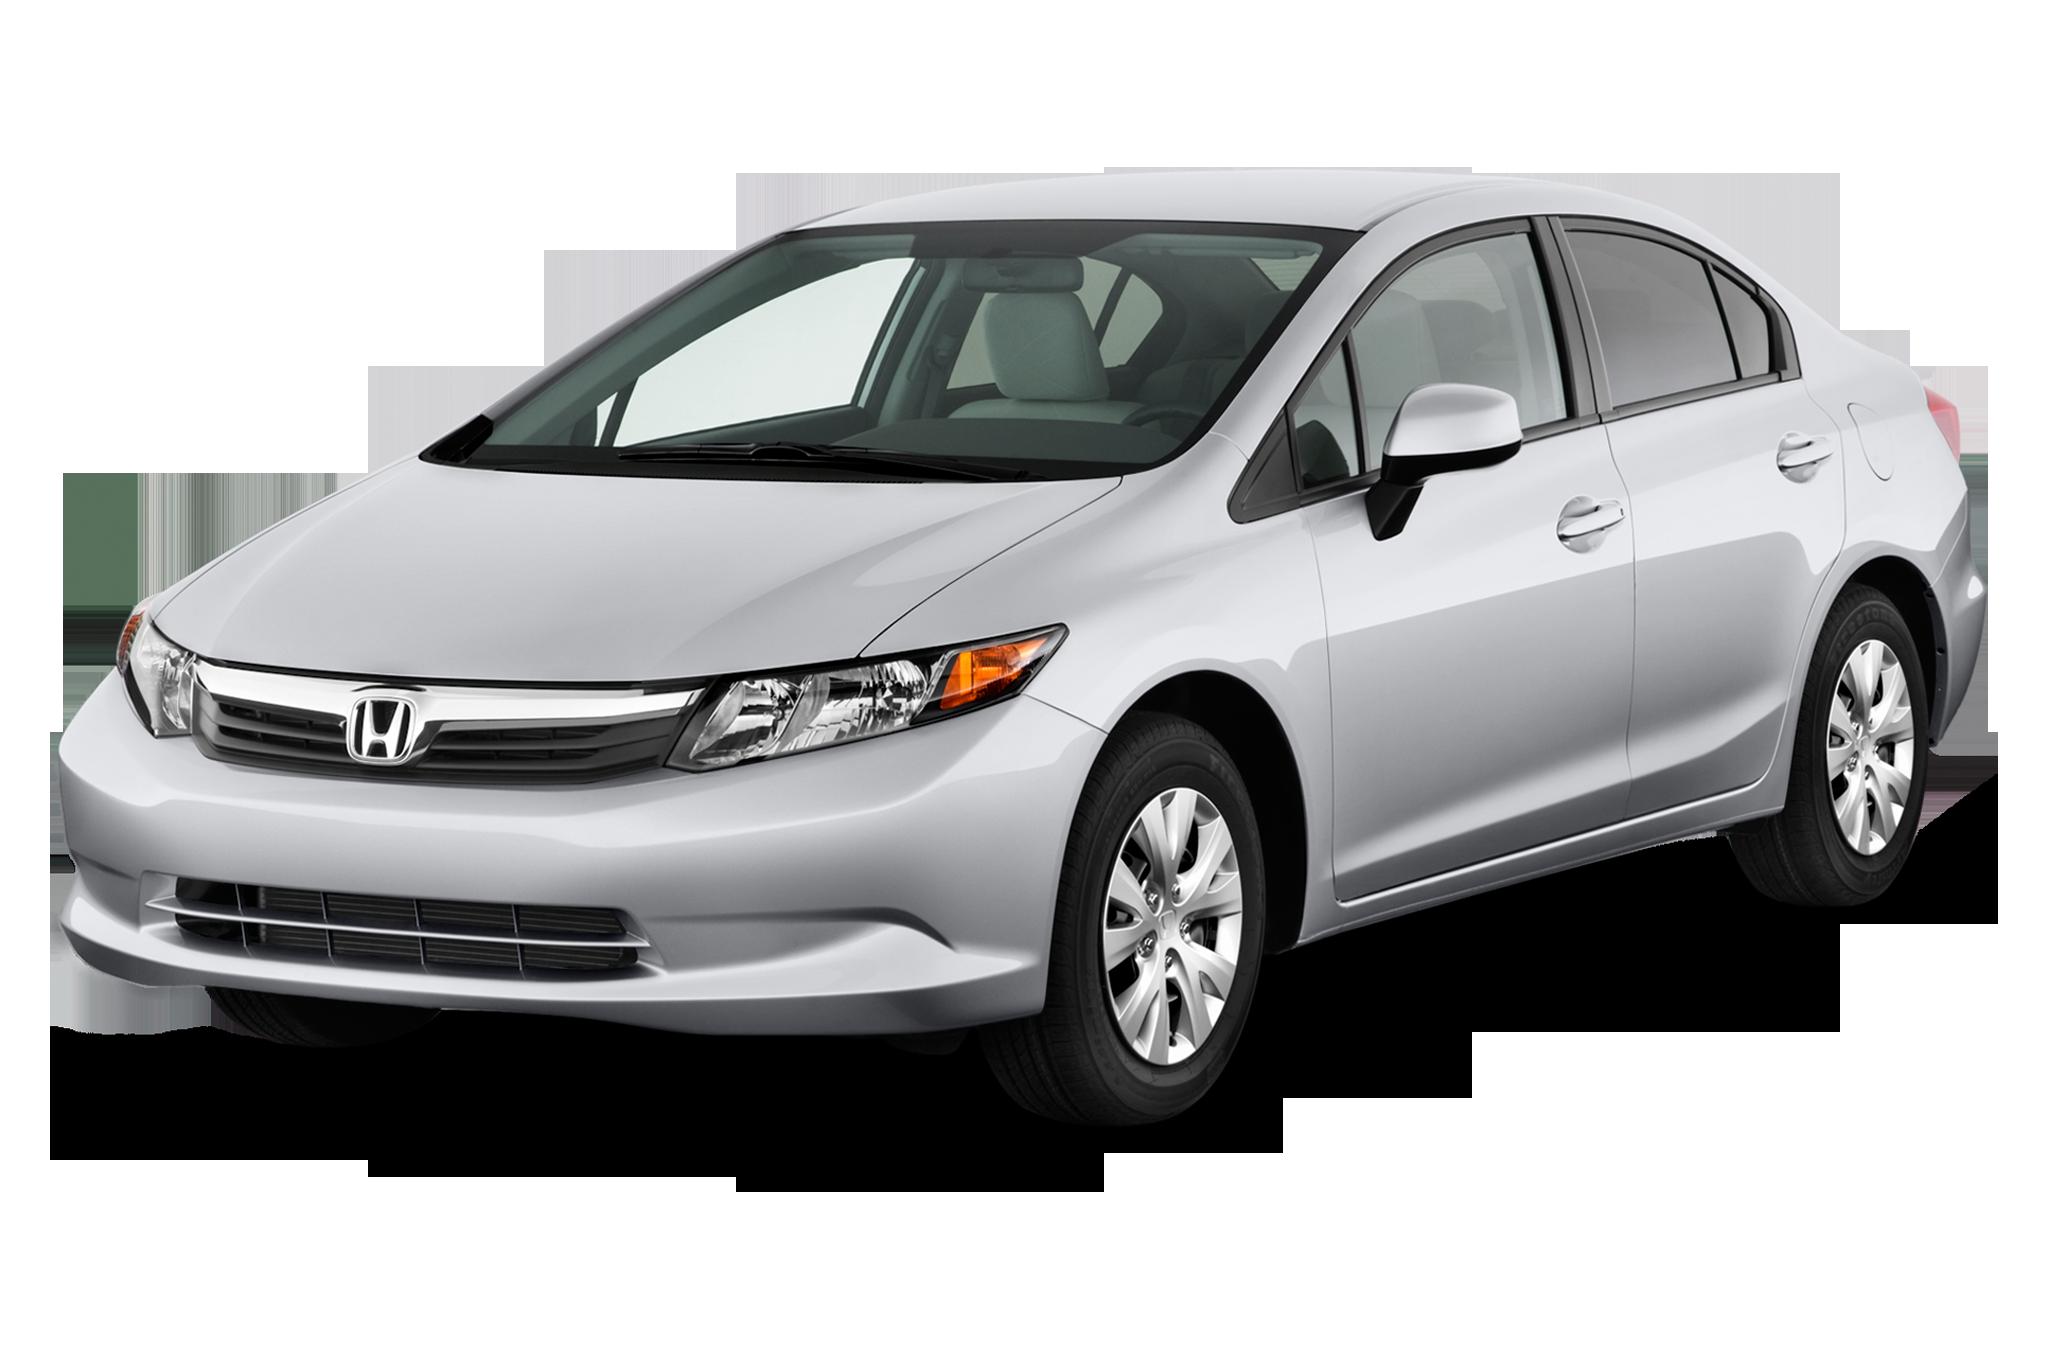 Naprawa Hybryd Honda Civic